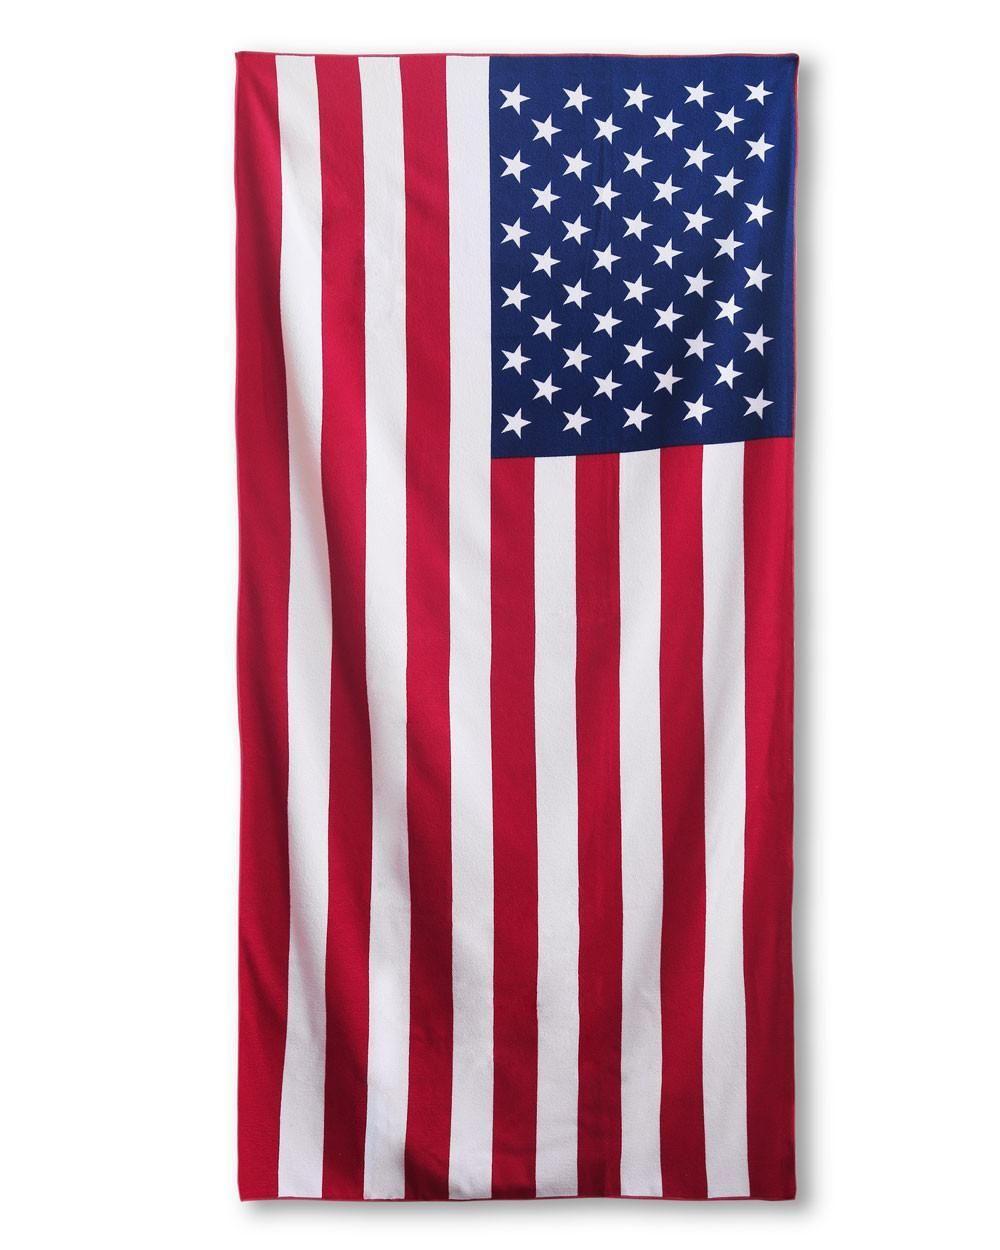 Coral Palms Printed Beach Towels Beach Towel American Flag Red